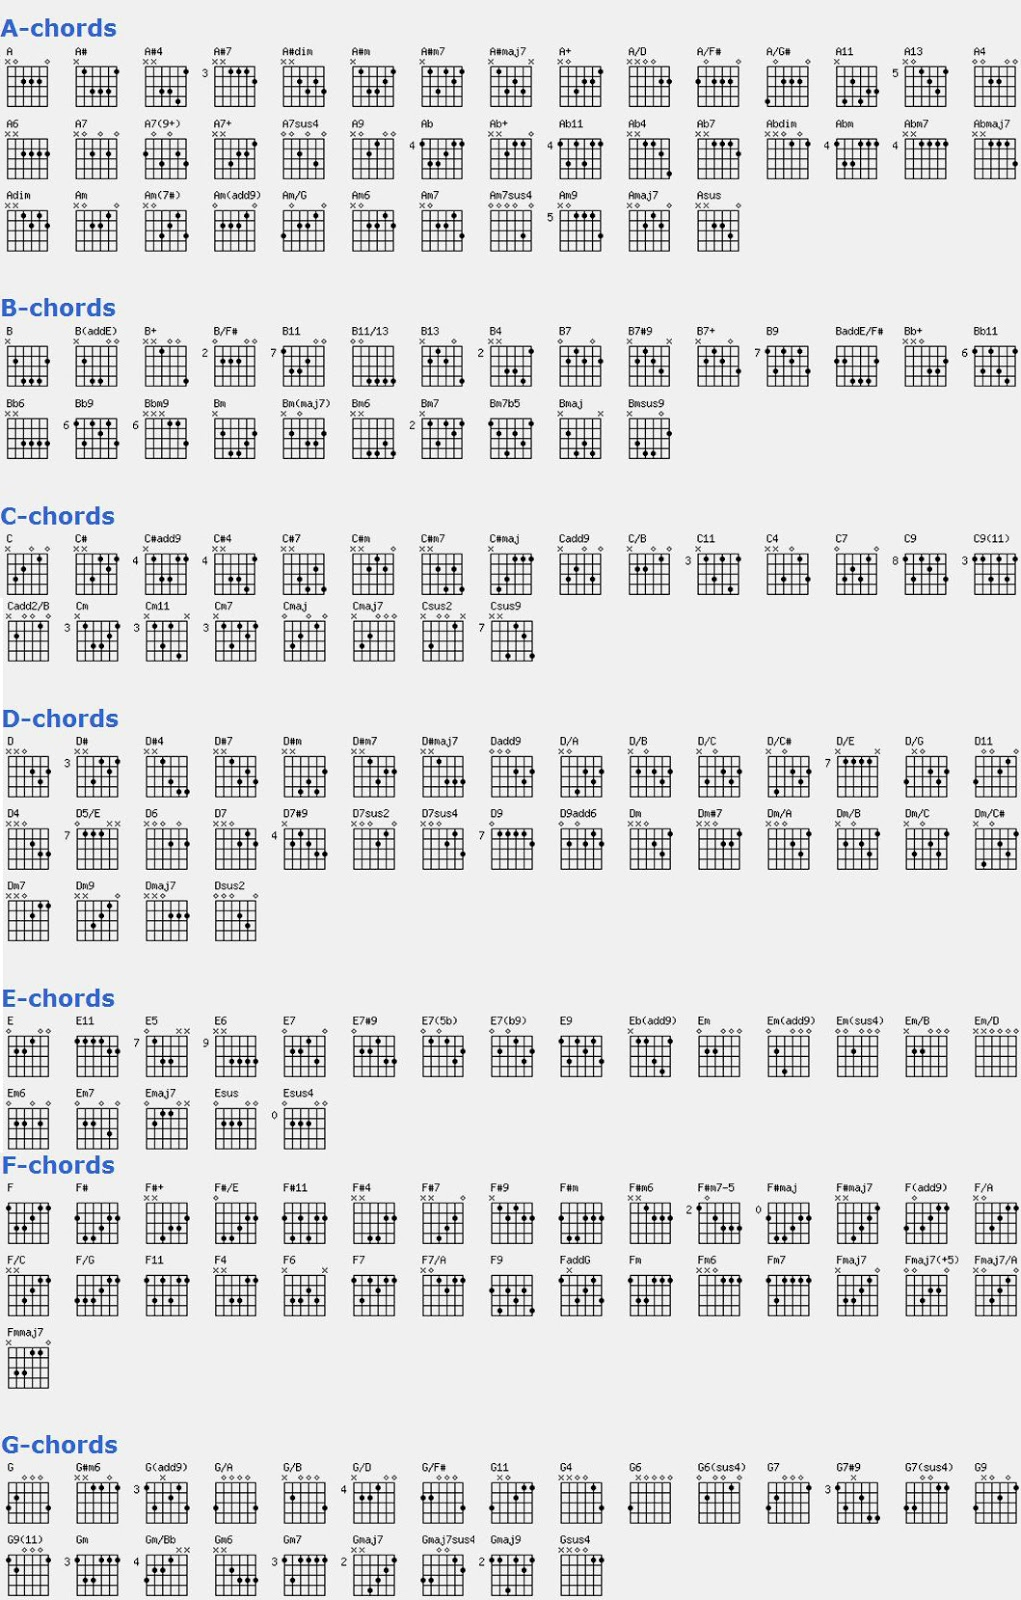 Tabel Kunci Gitar Lengkap Kord Gitar Kord Guitar Surawanozhi